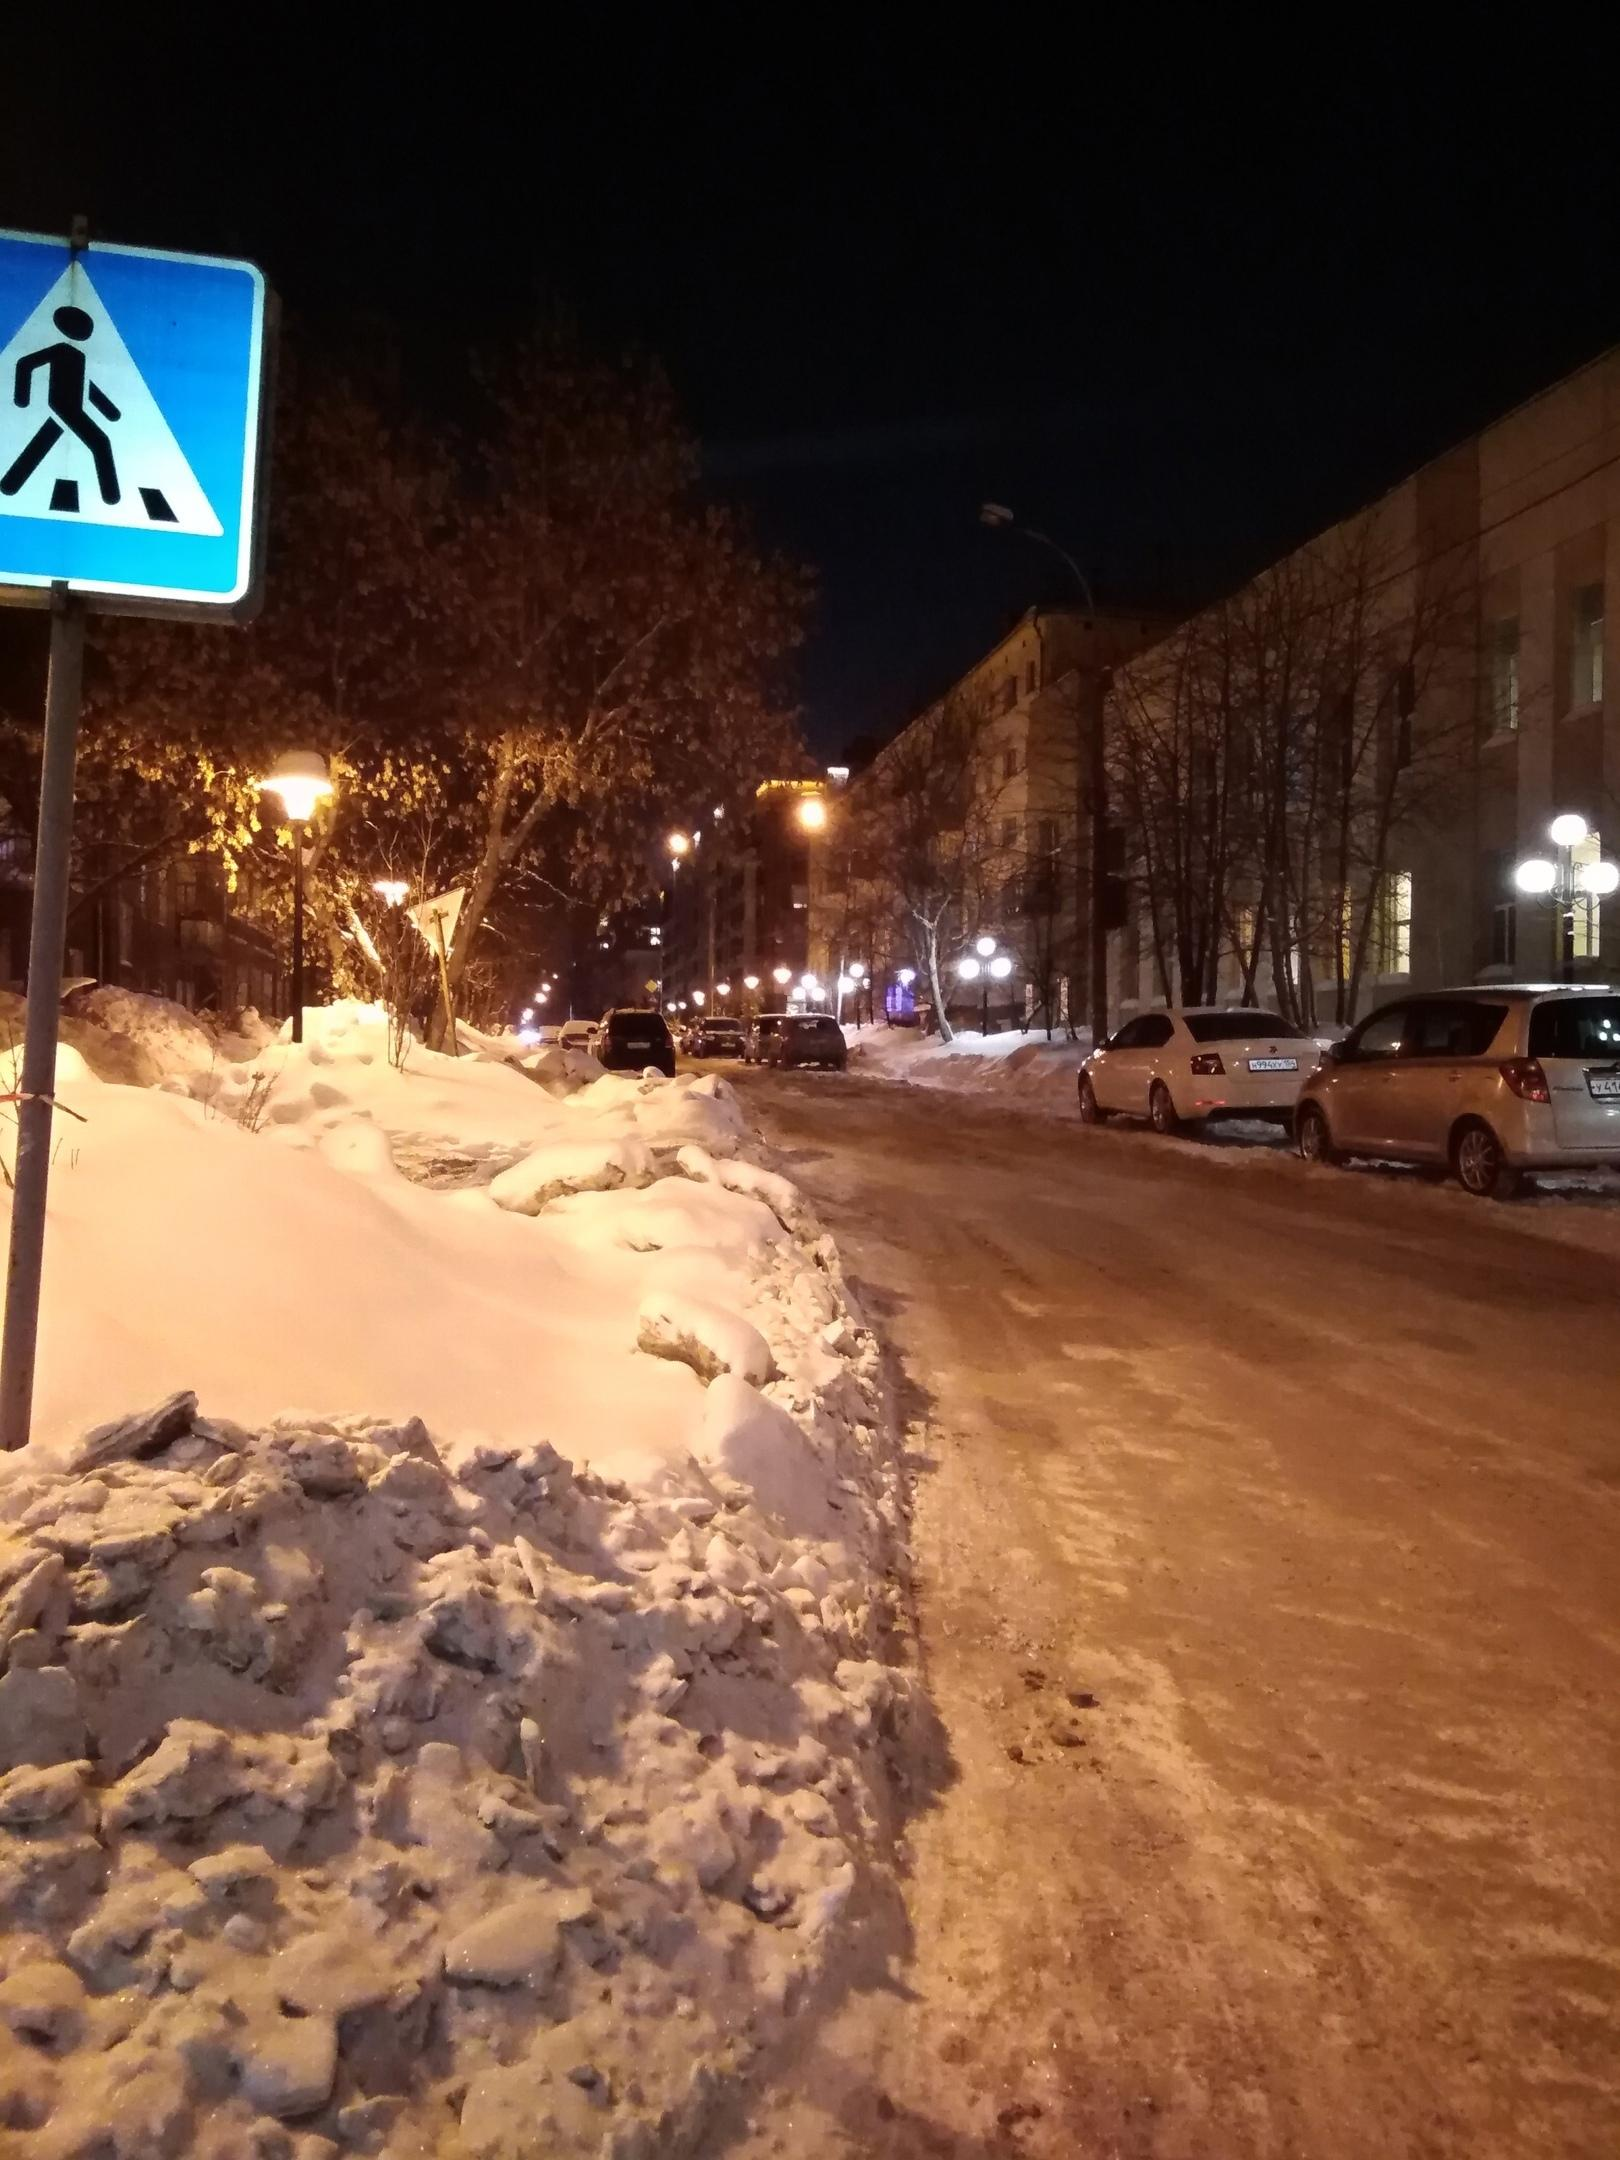 Фото Прокуратура проверит, как с улиц Новосибирска убирают снег 4